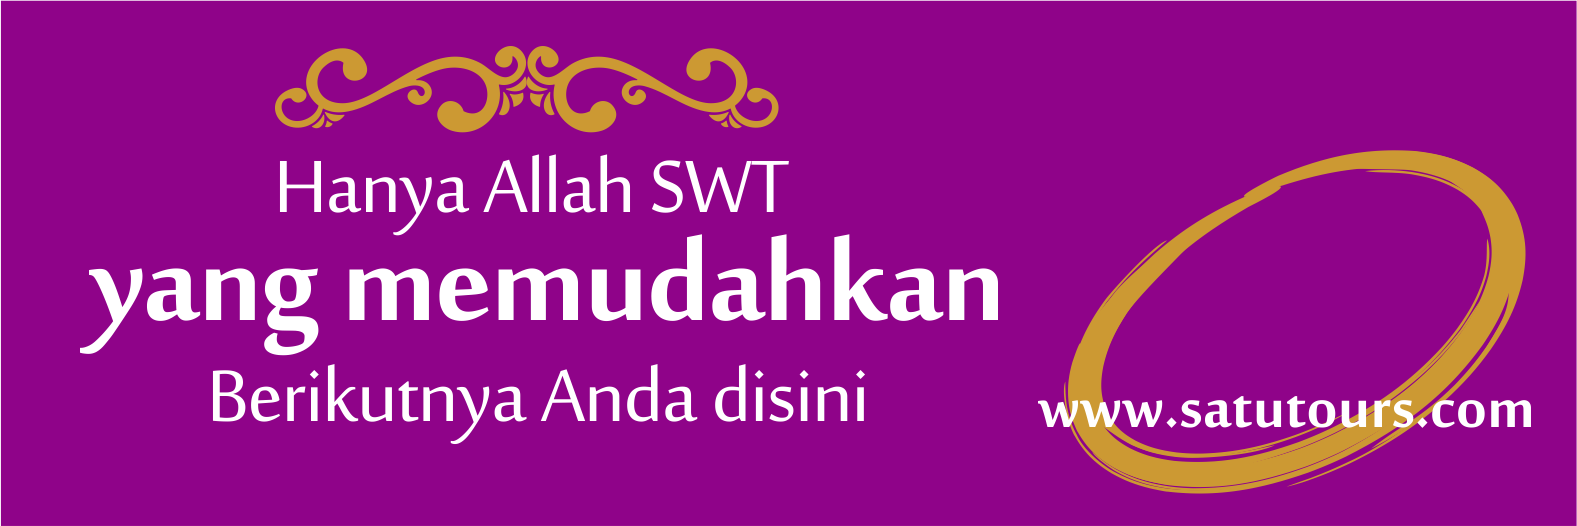 Umroh 2014 Bandung untuk Anda dan Keluarga